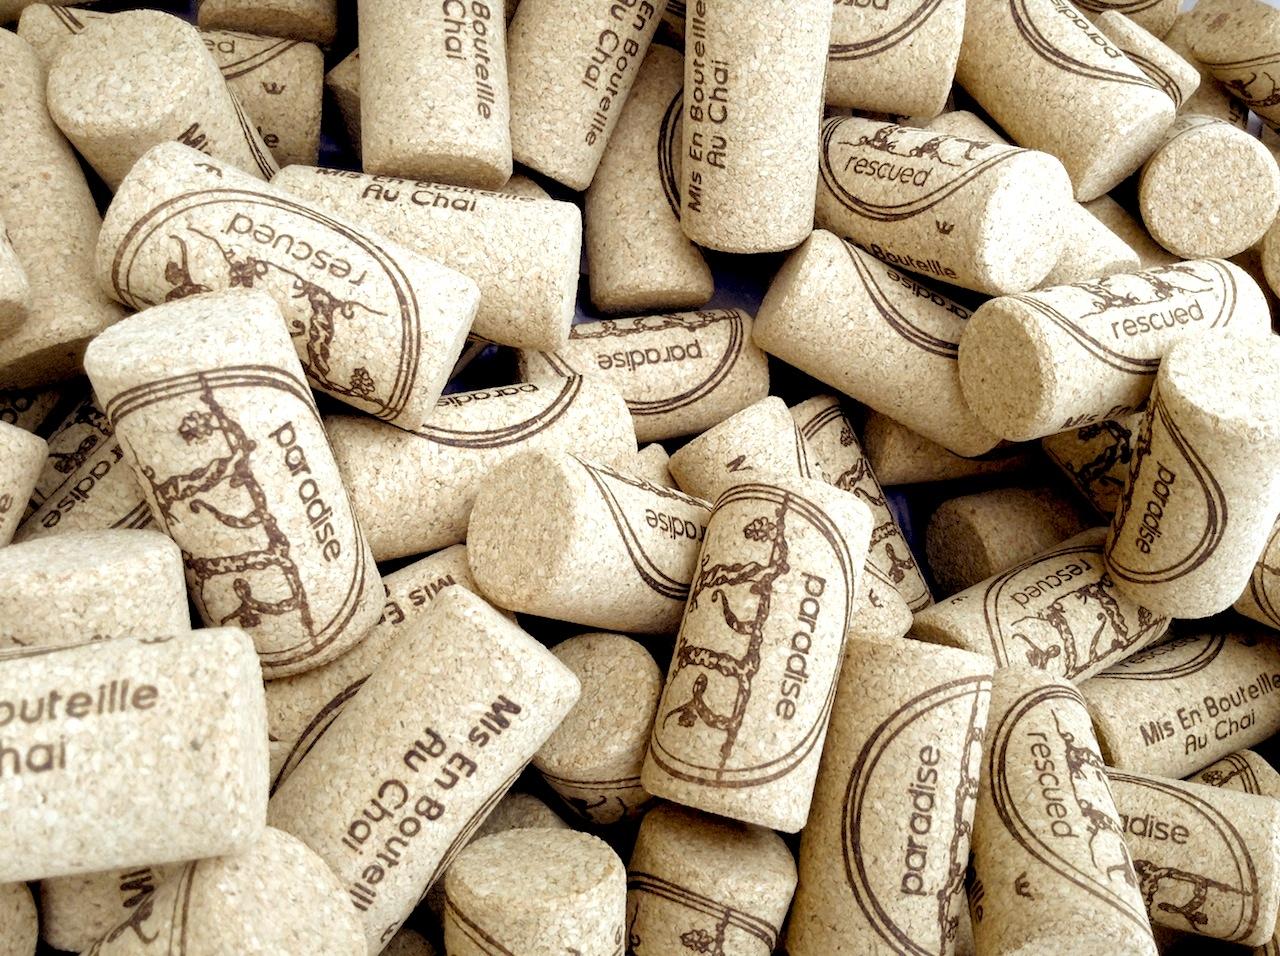 Paradise Rescued designer BTEC+ corks